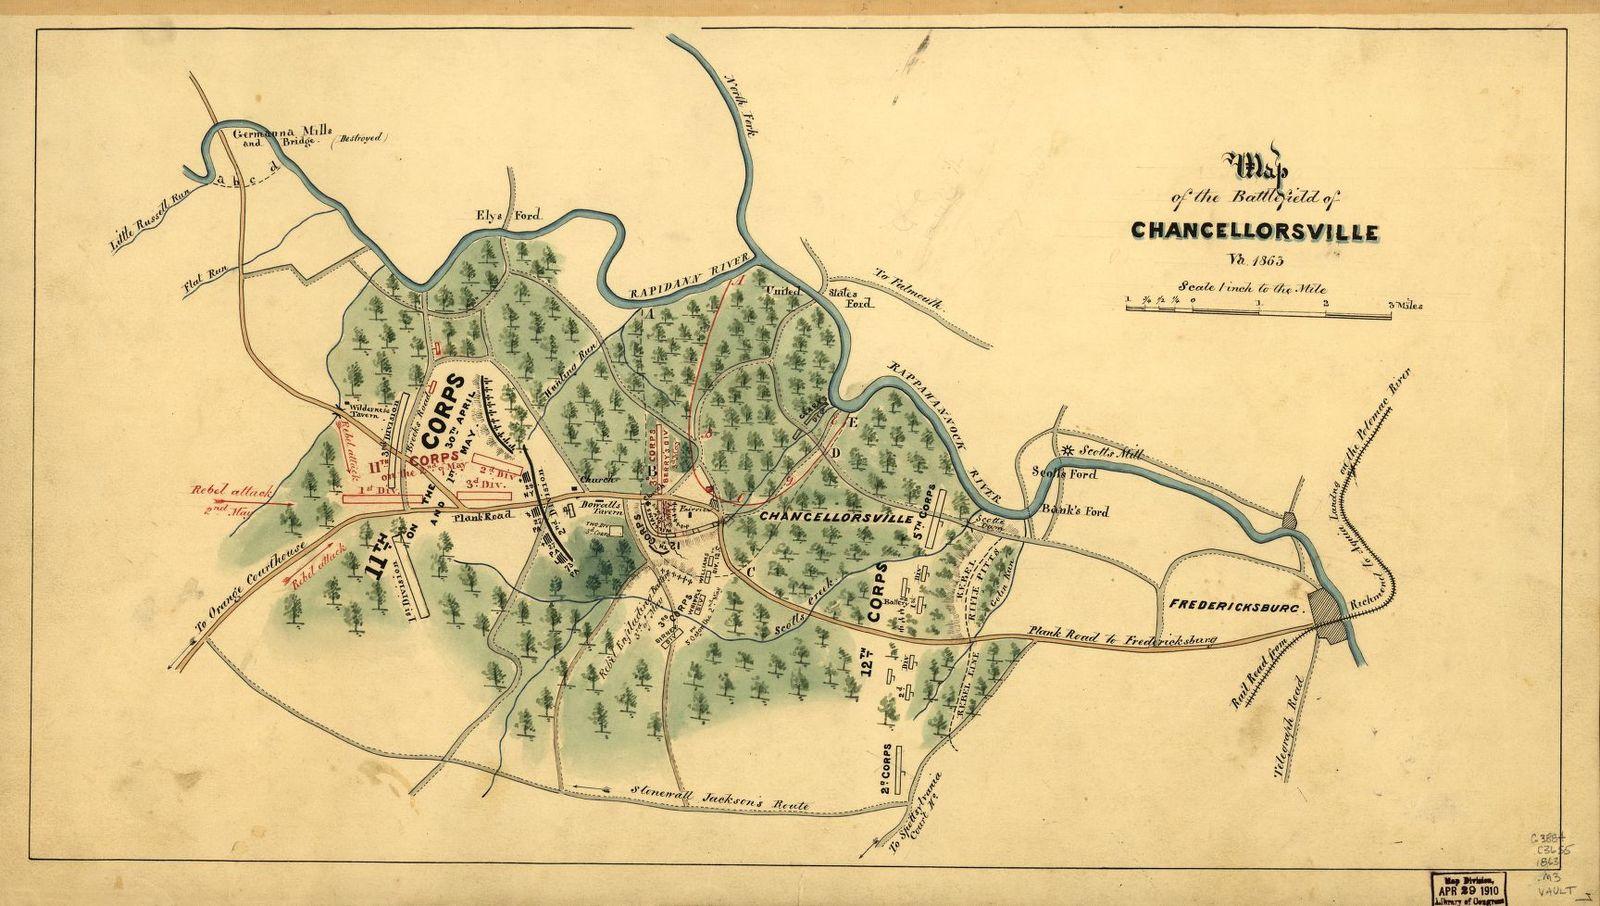 Map of the battlefield of Chancellorsville, Va., 1863. | PICRYL Chancellorsville Battlefield Map on